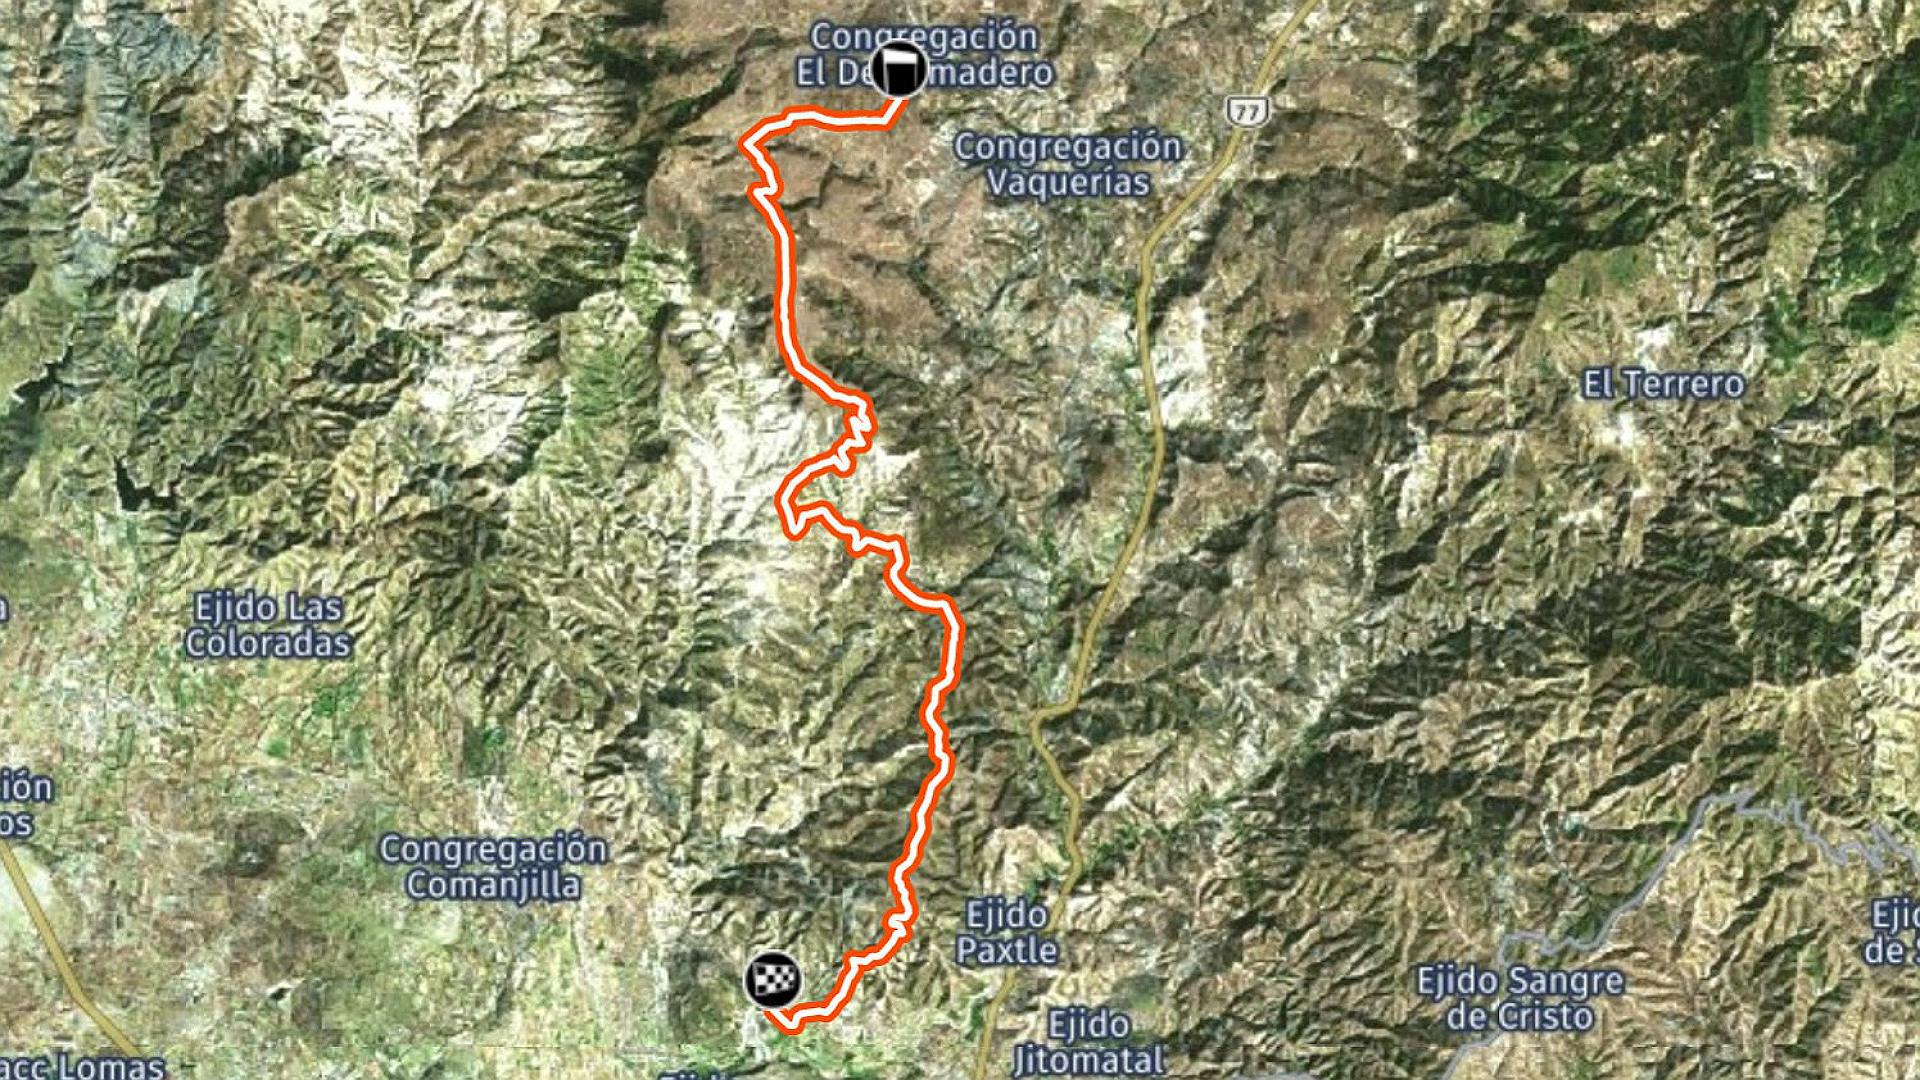 WRC: 17º Rallye Guanajuato Corona - México [12-15 Marzo] - Página 5 140320_WRCTV-SS15map-2020_001